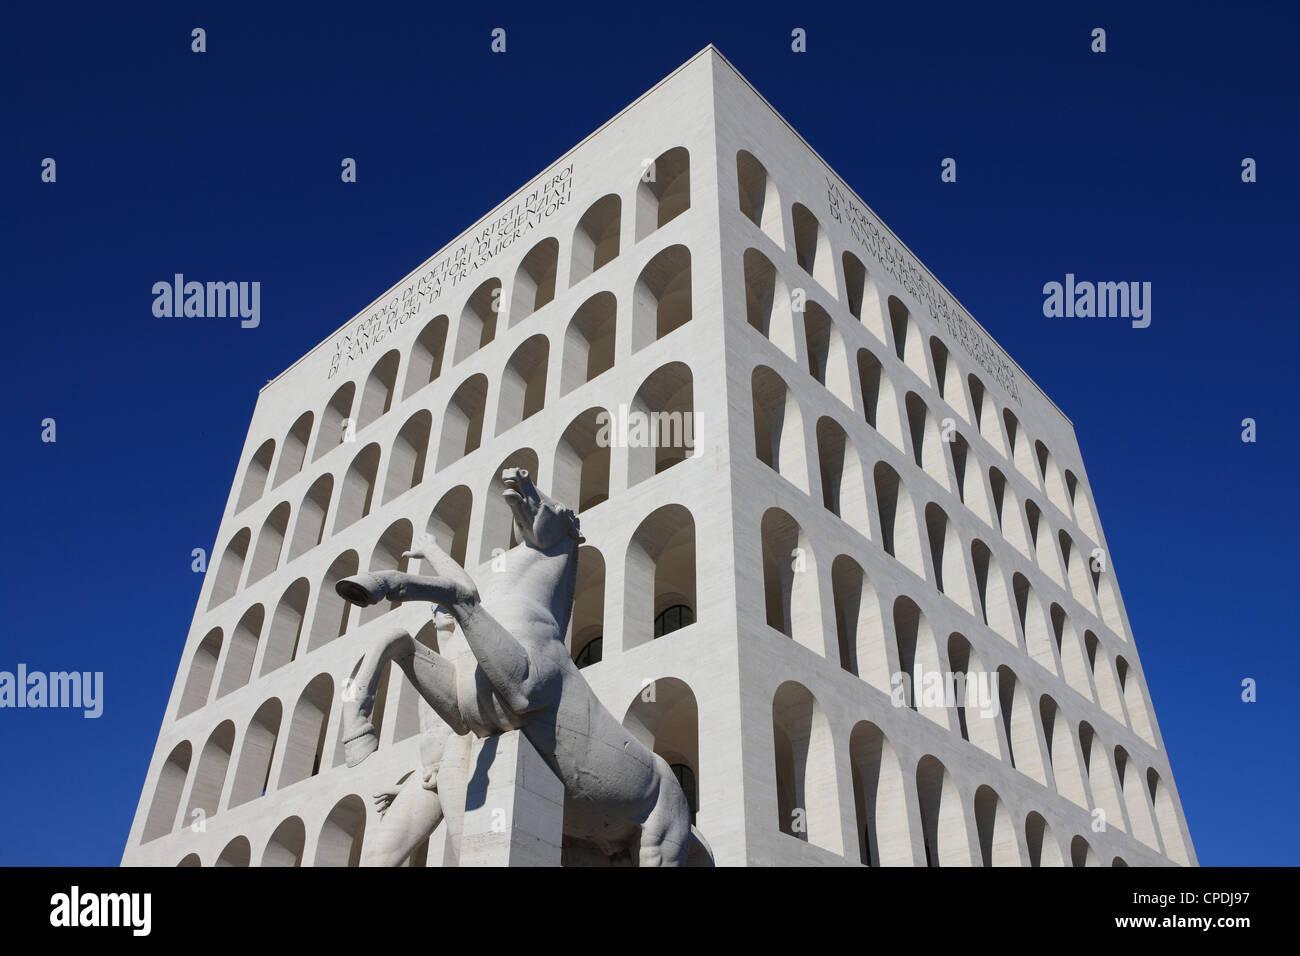 Palazzo della Civilta Italiana, Euro, Rom, Latium, Italien, Europa Stockbild